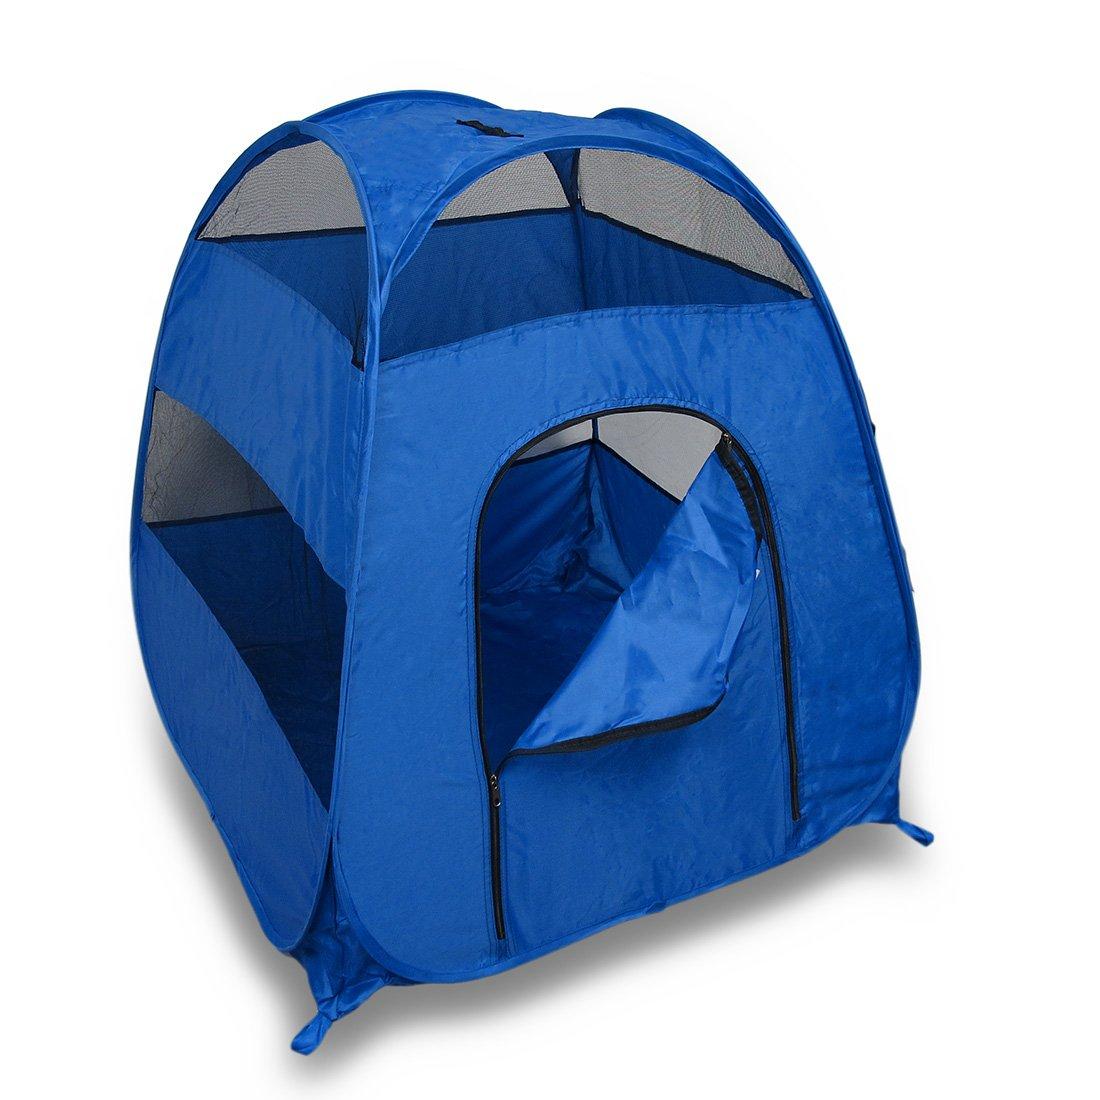 Blue Portable Pop-Up Pet Tent Medium / Large Dogs Cats